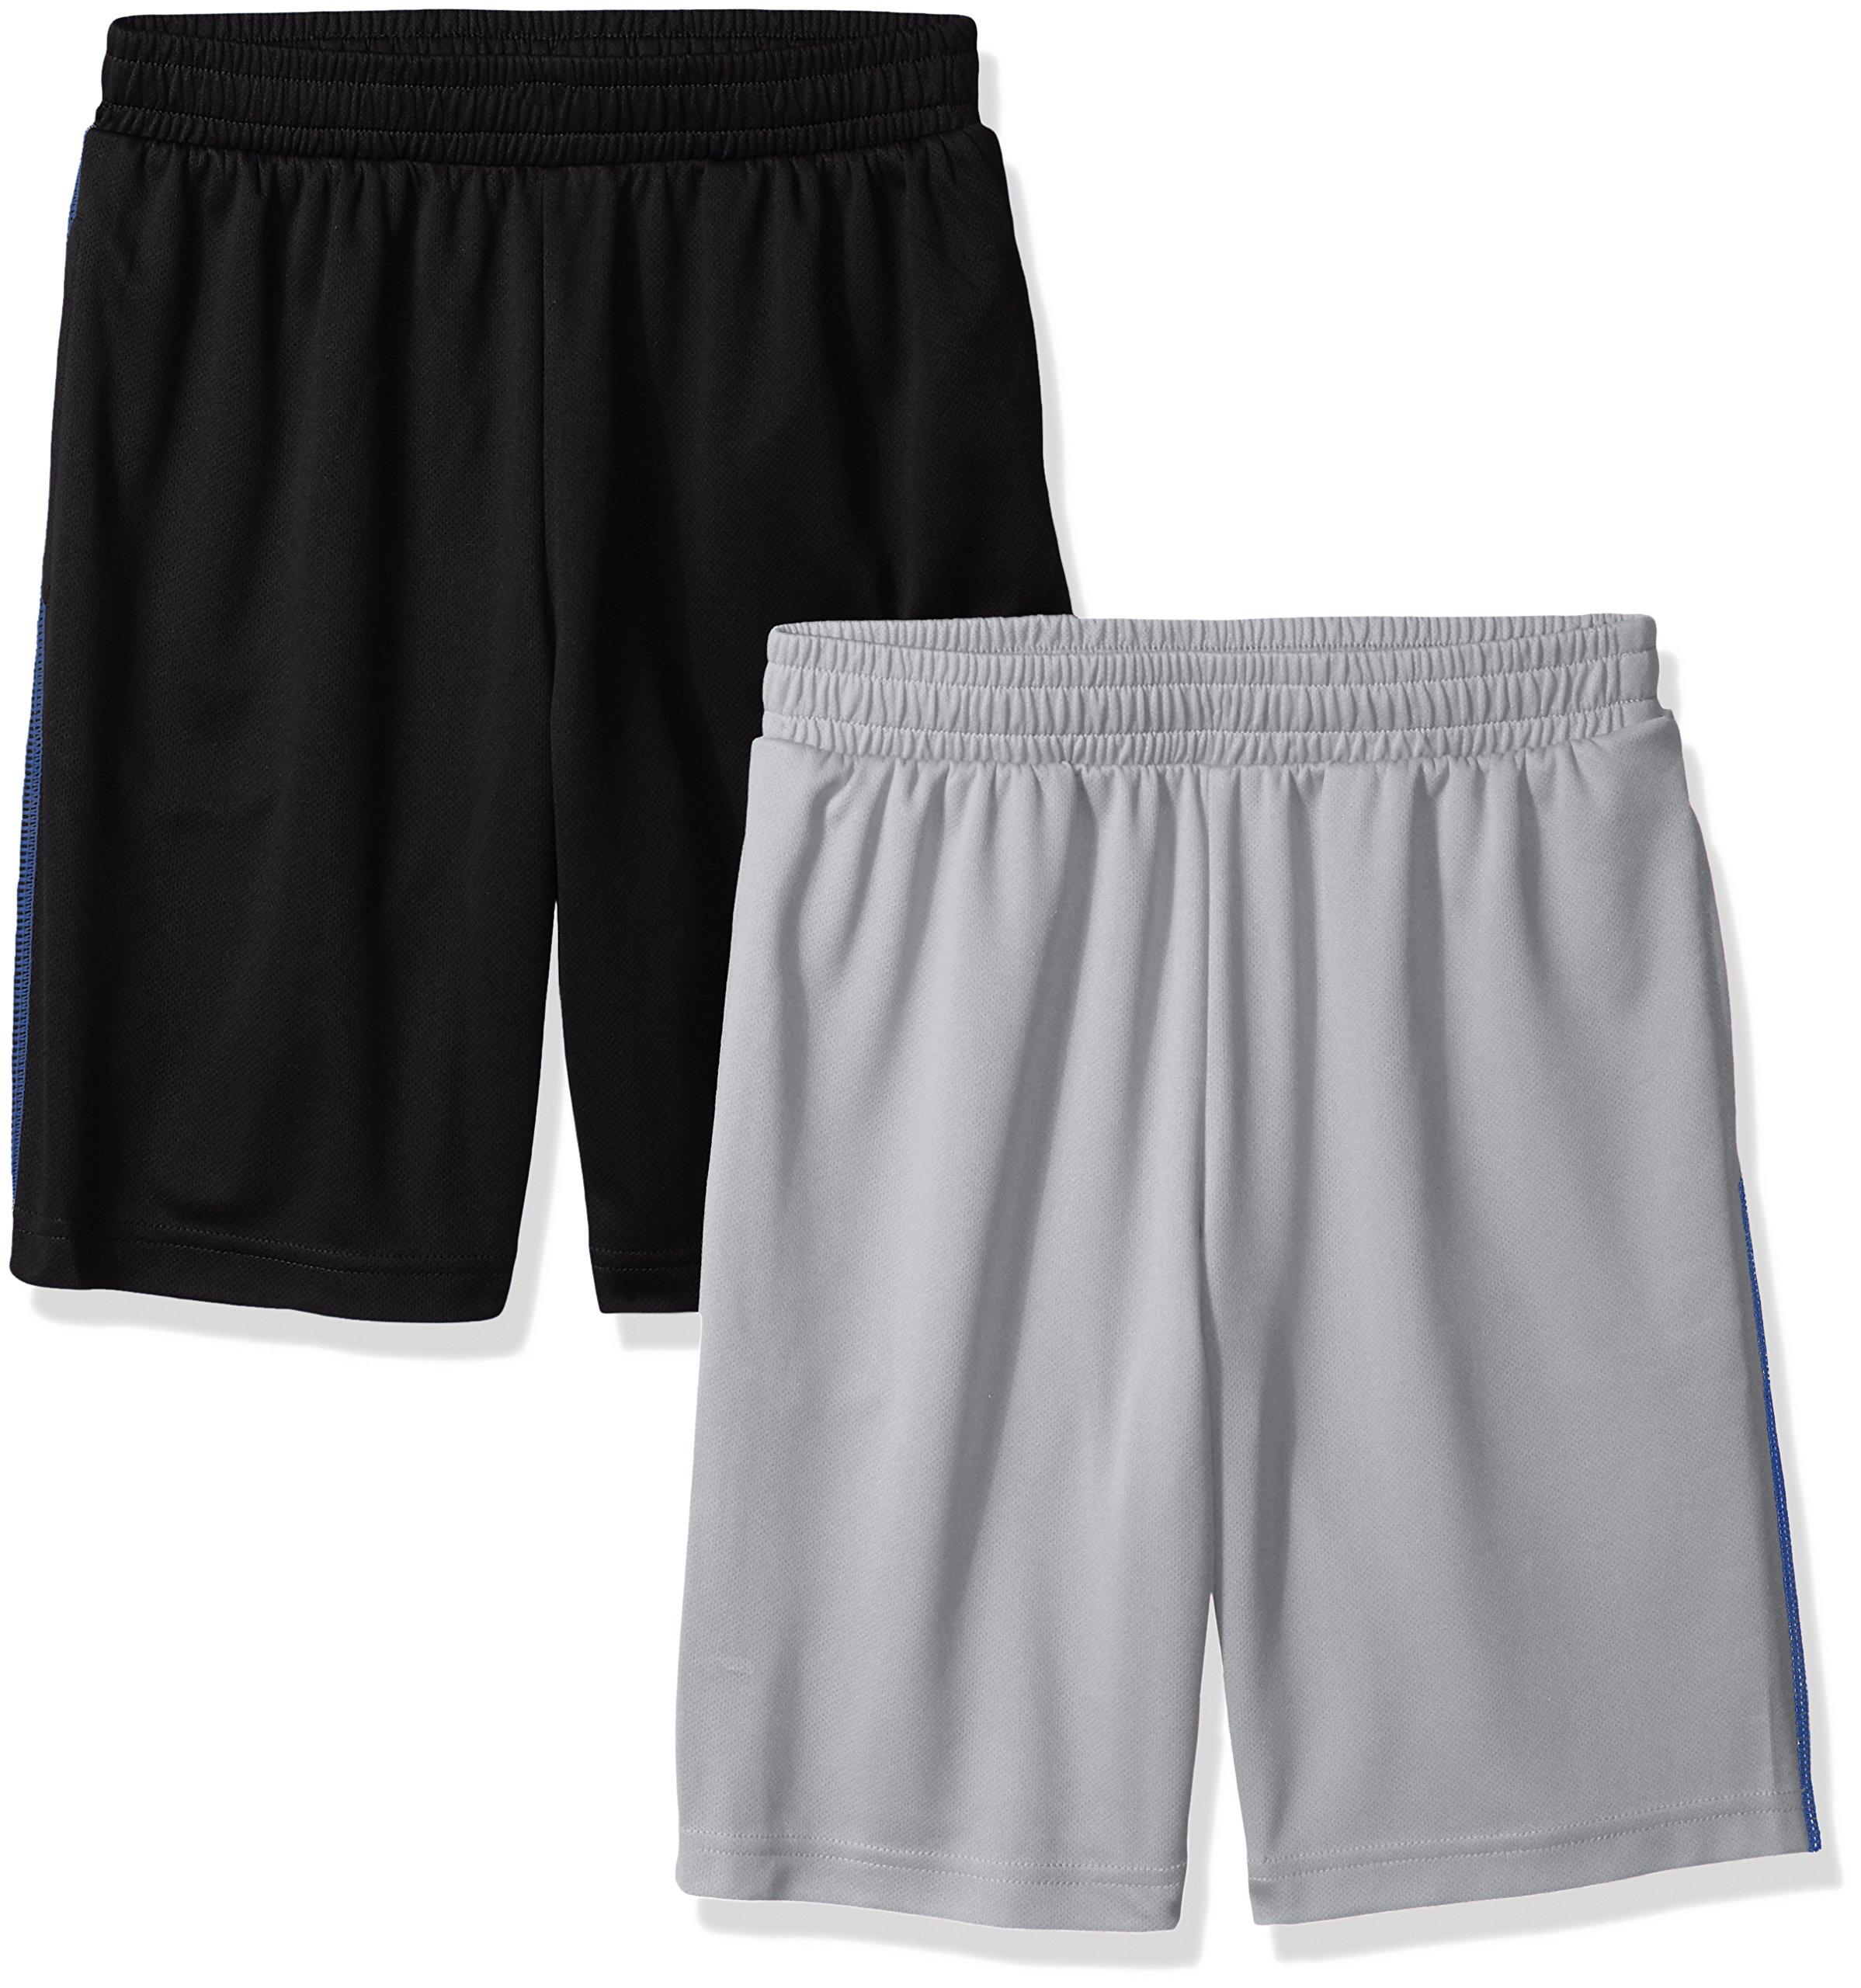 Amazon Essentials Boys Active Performance Mesh Basketball Shorts- Buy  Online in Belize at belize.desertcart.com. ProductId : 107390438.